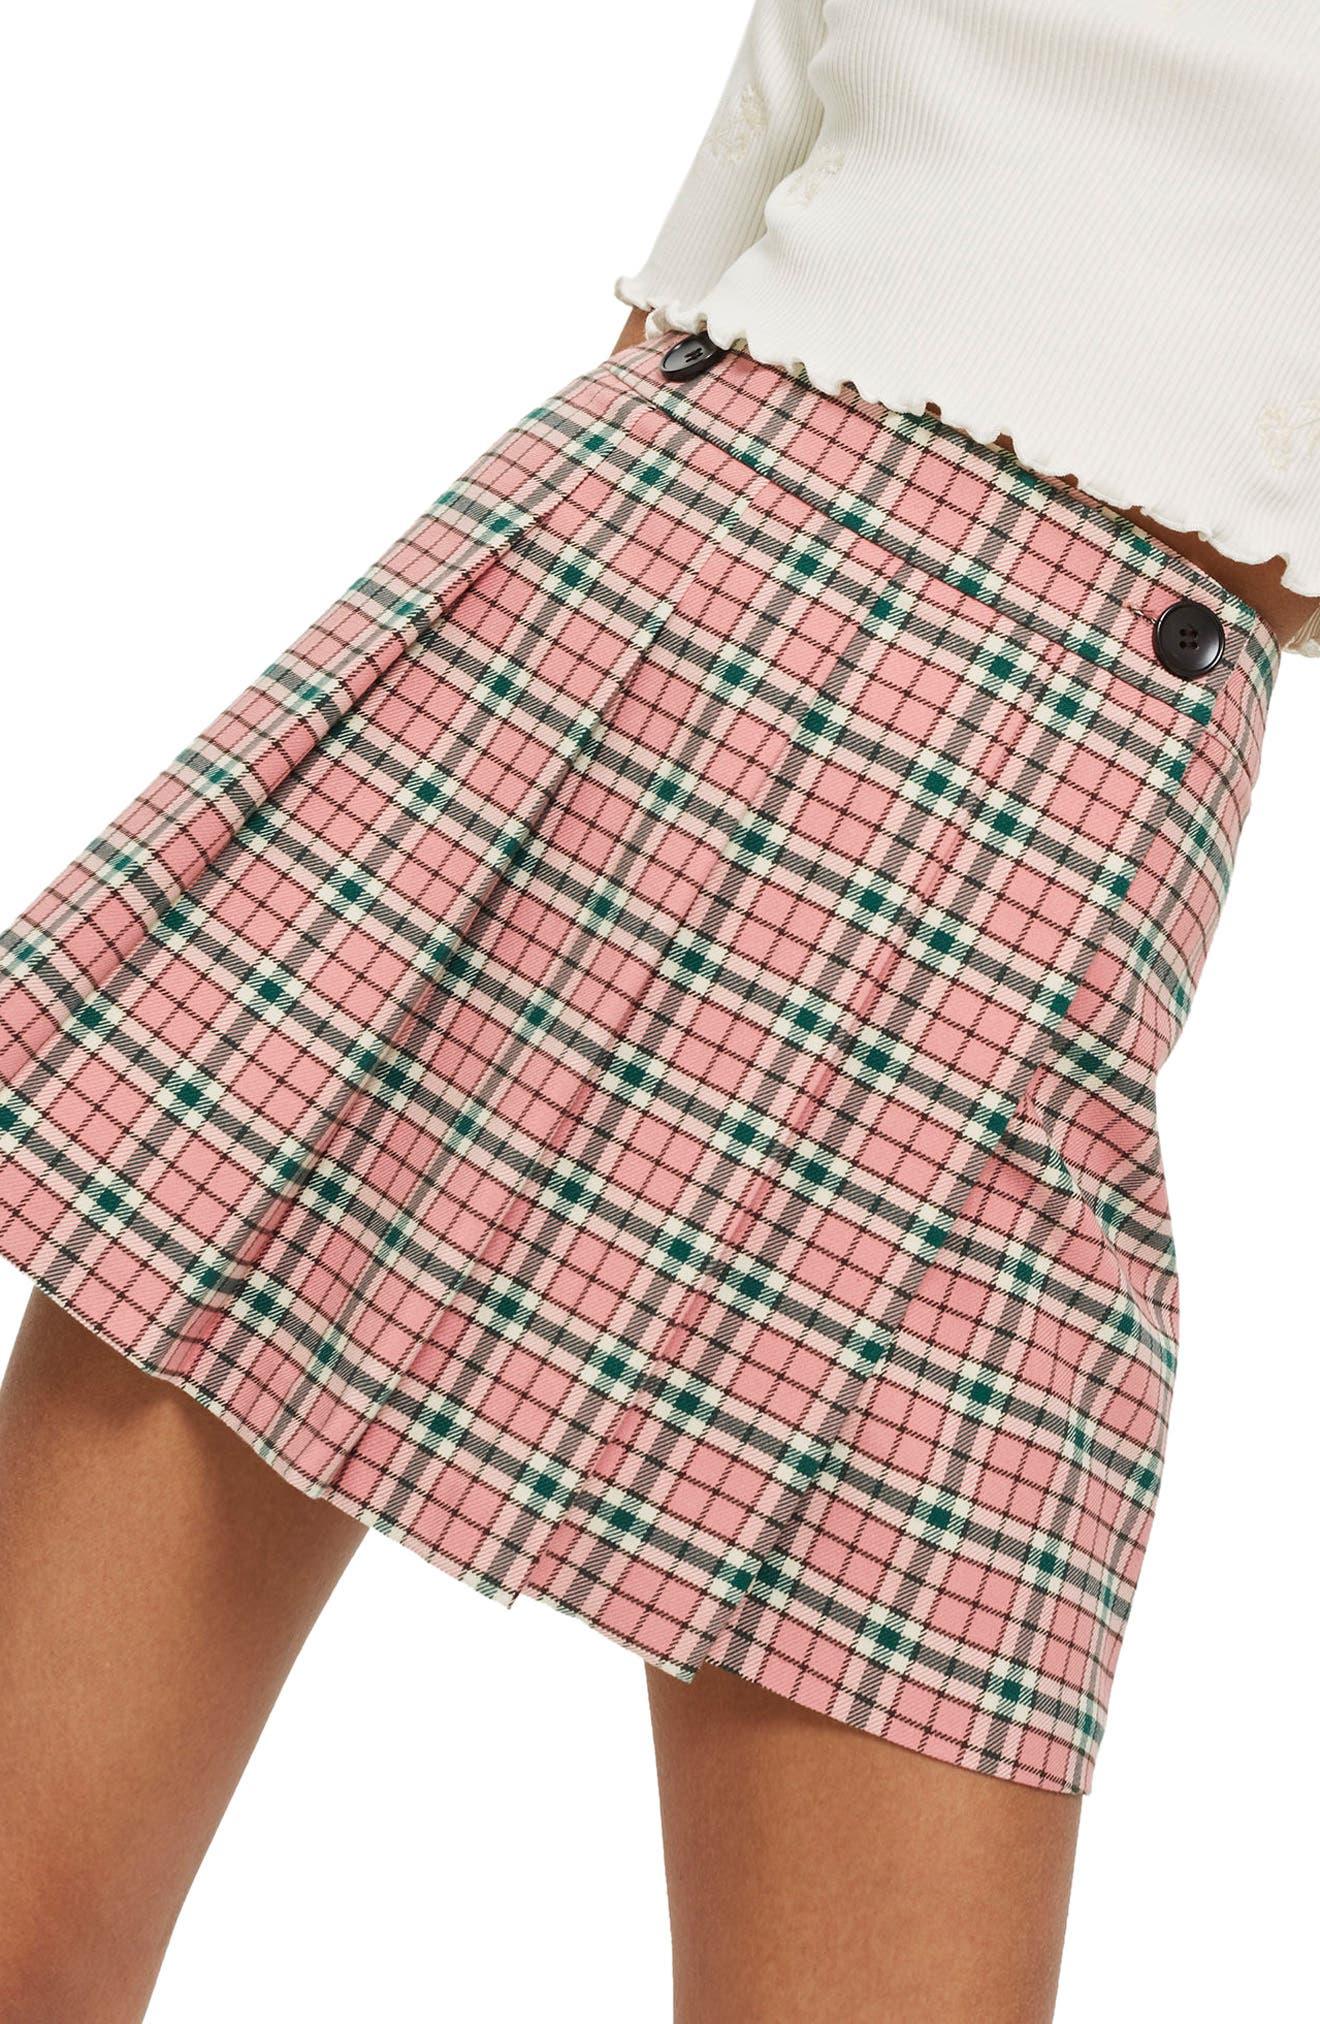 Main Image - Topshop Summer Check Kilt Miniskirt